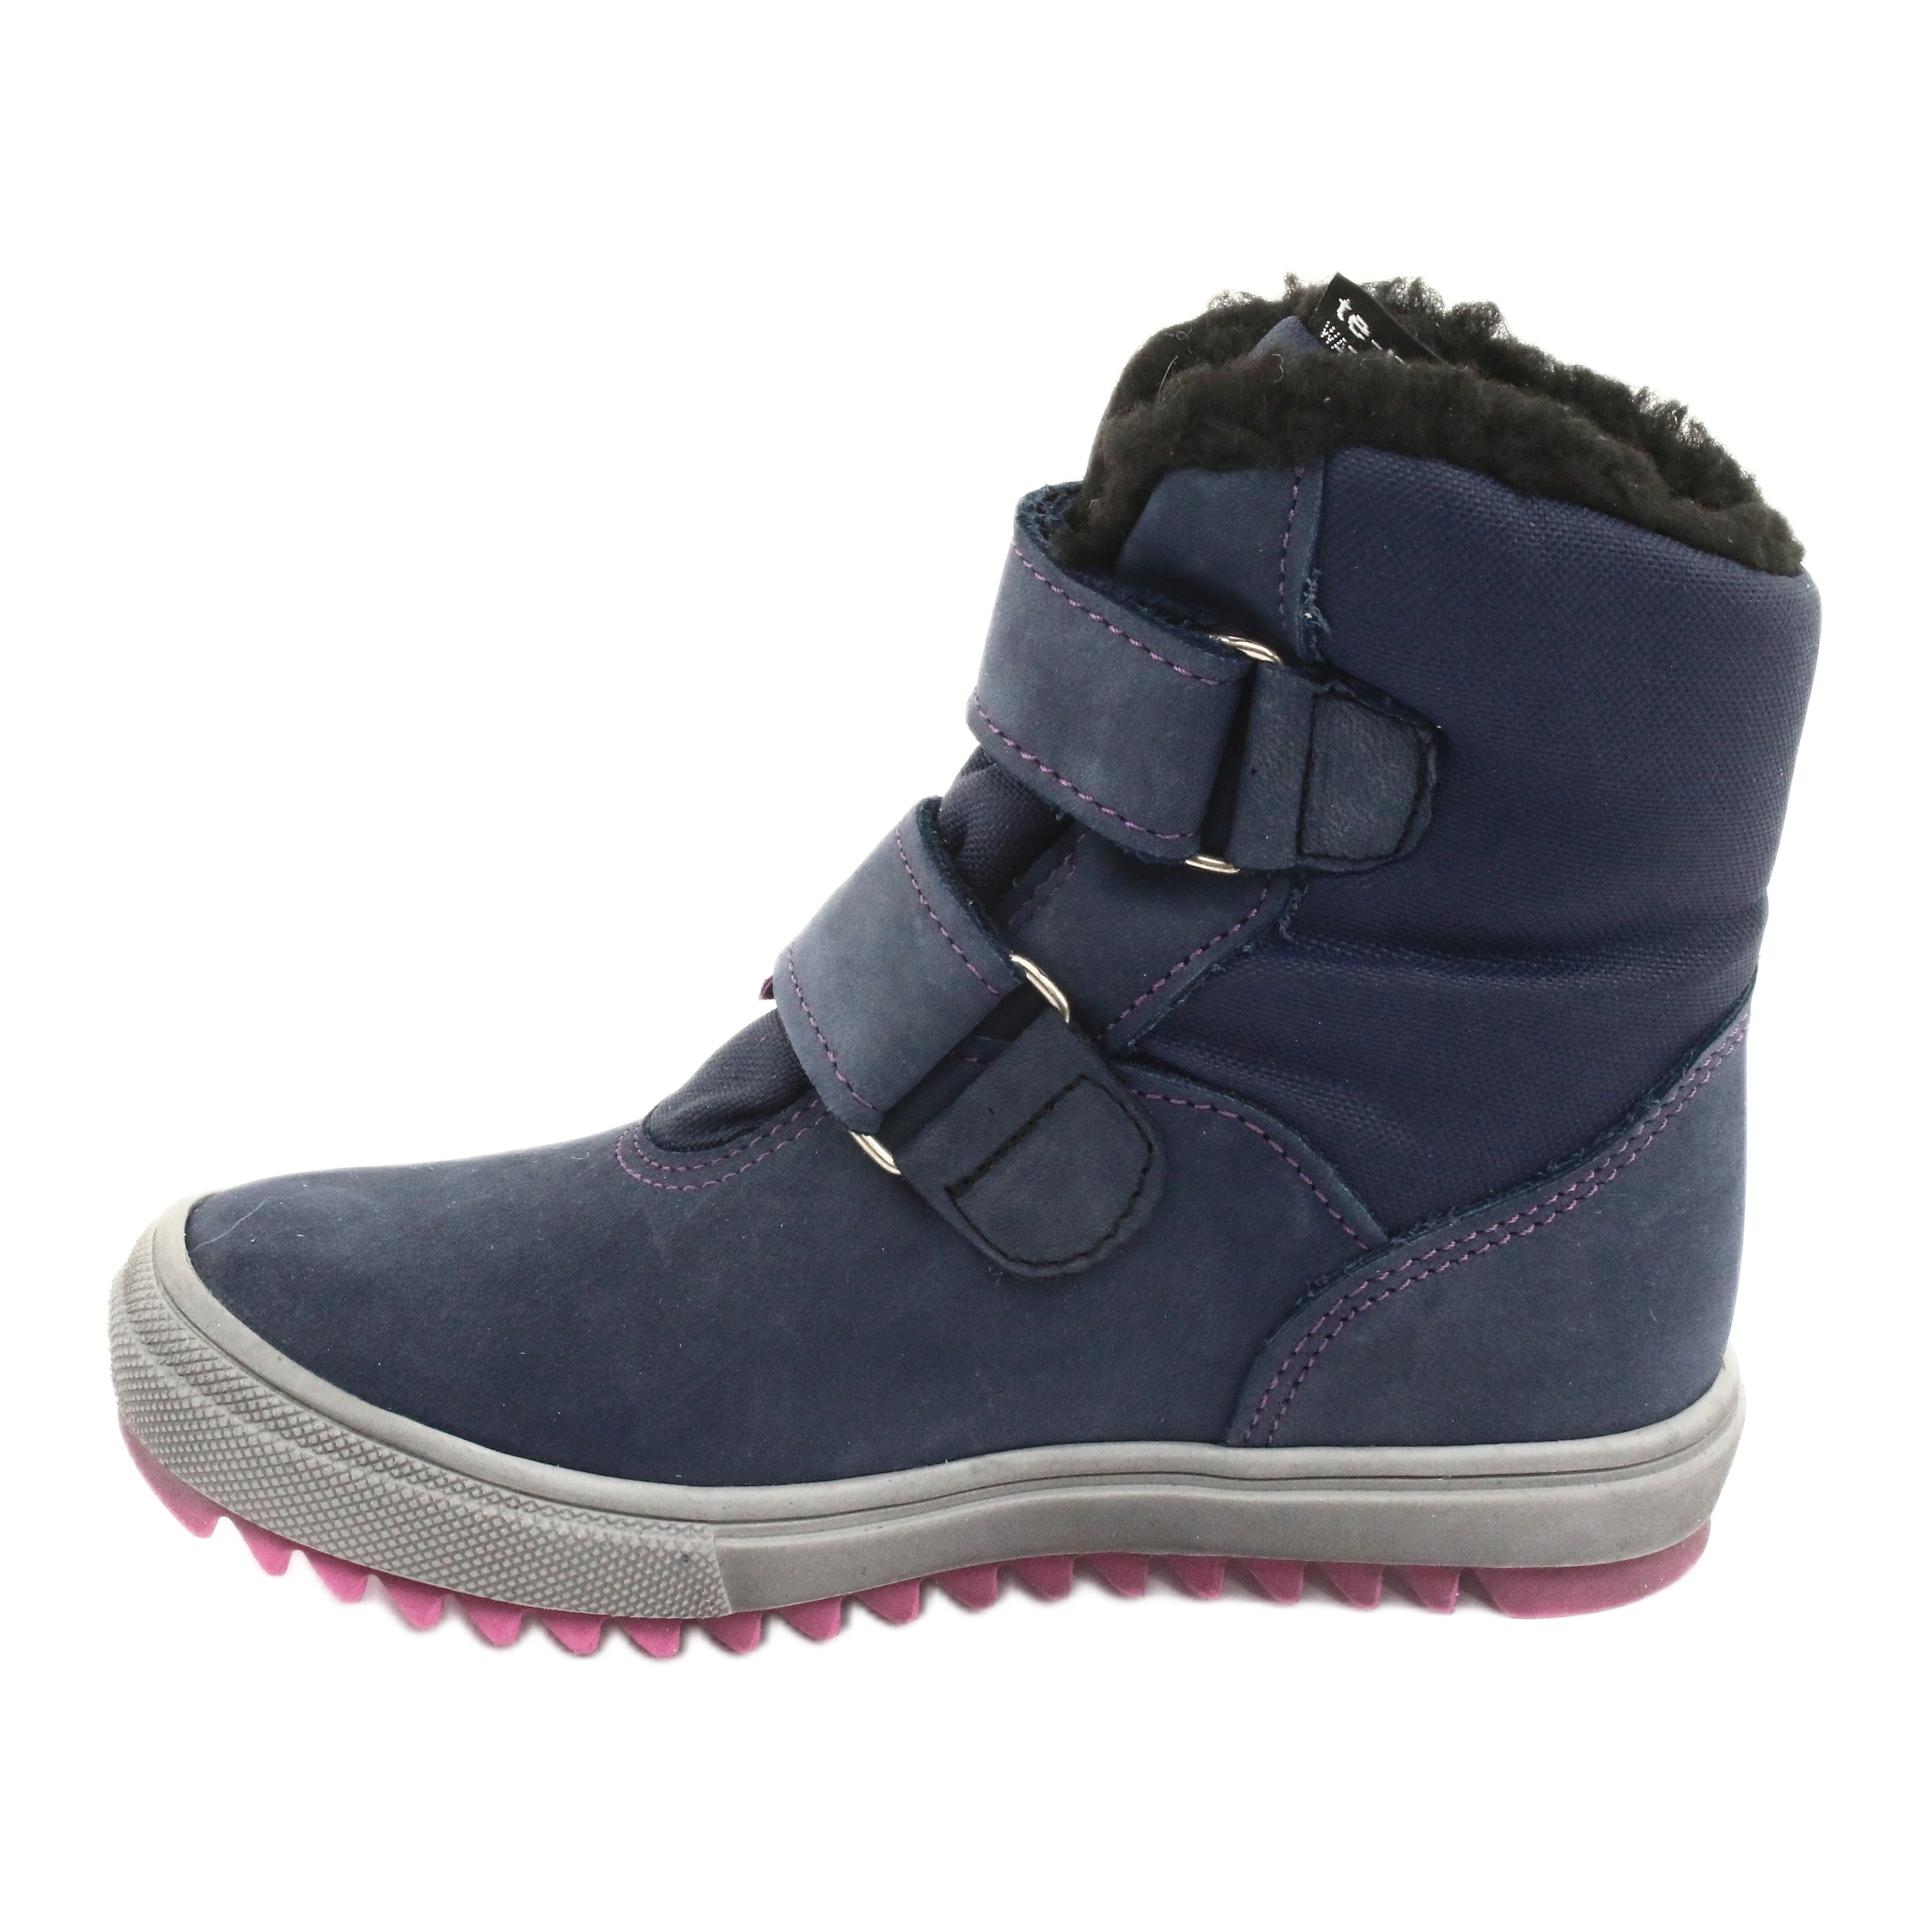 miniatura 3 - Stivali con una membrana Mazurek 1353 blu scuro marina rosa